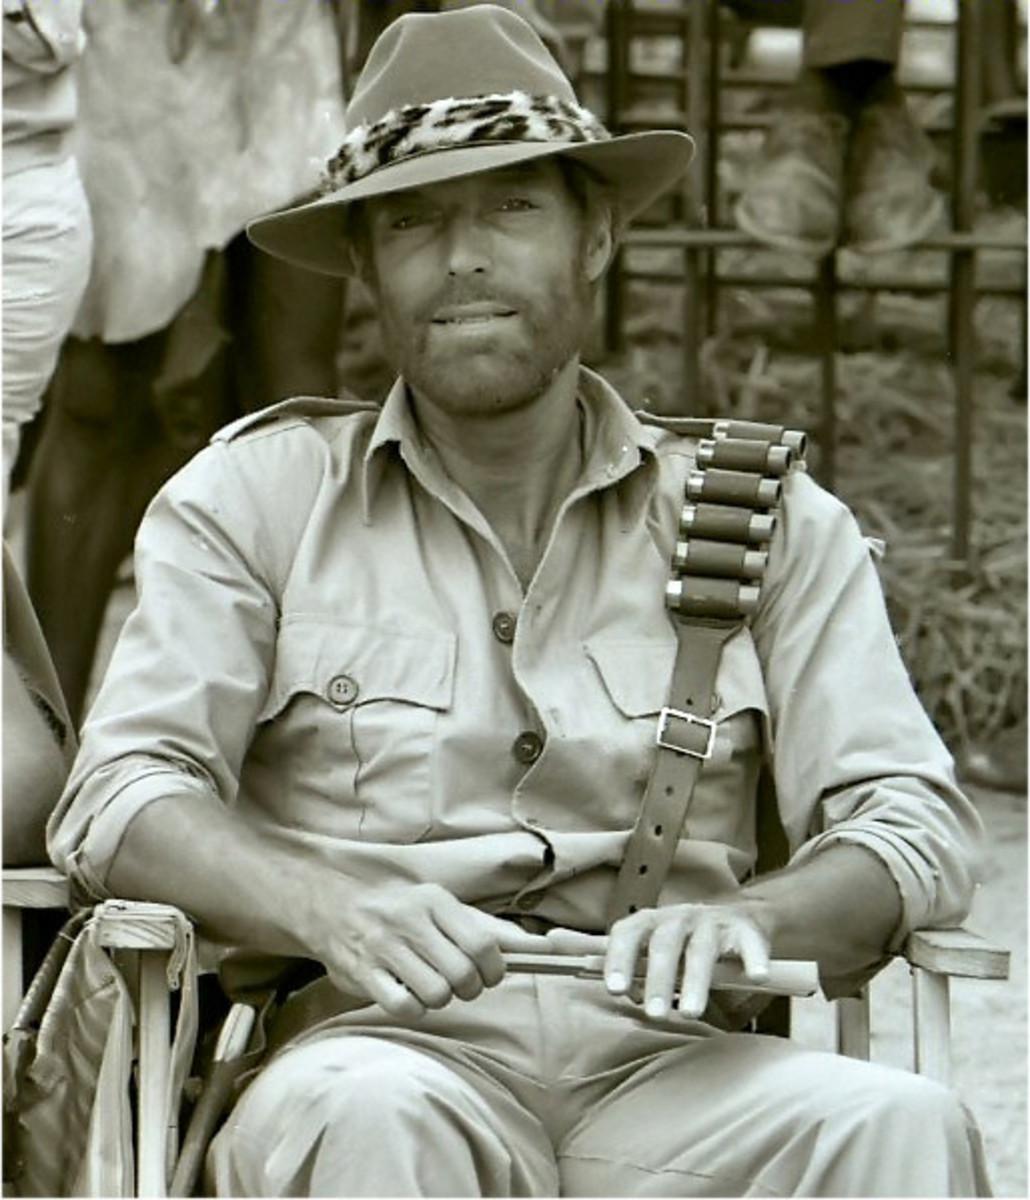 Richard Chamberlain starring as Allan Quatermain in King Solomon's Mines 1985.